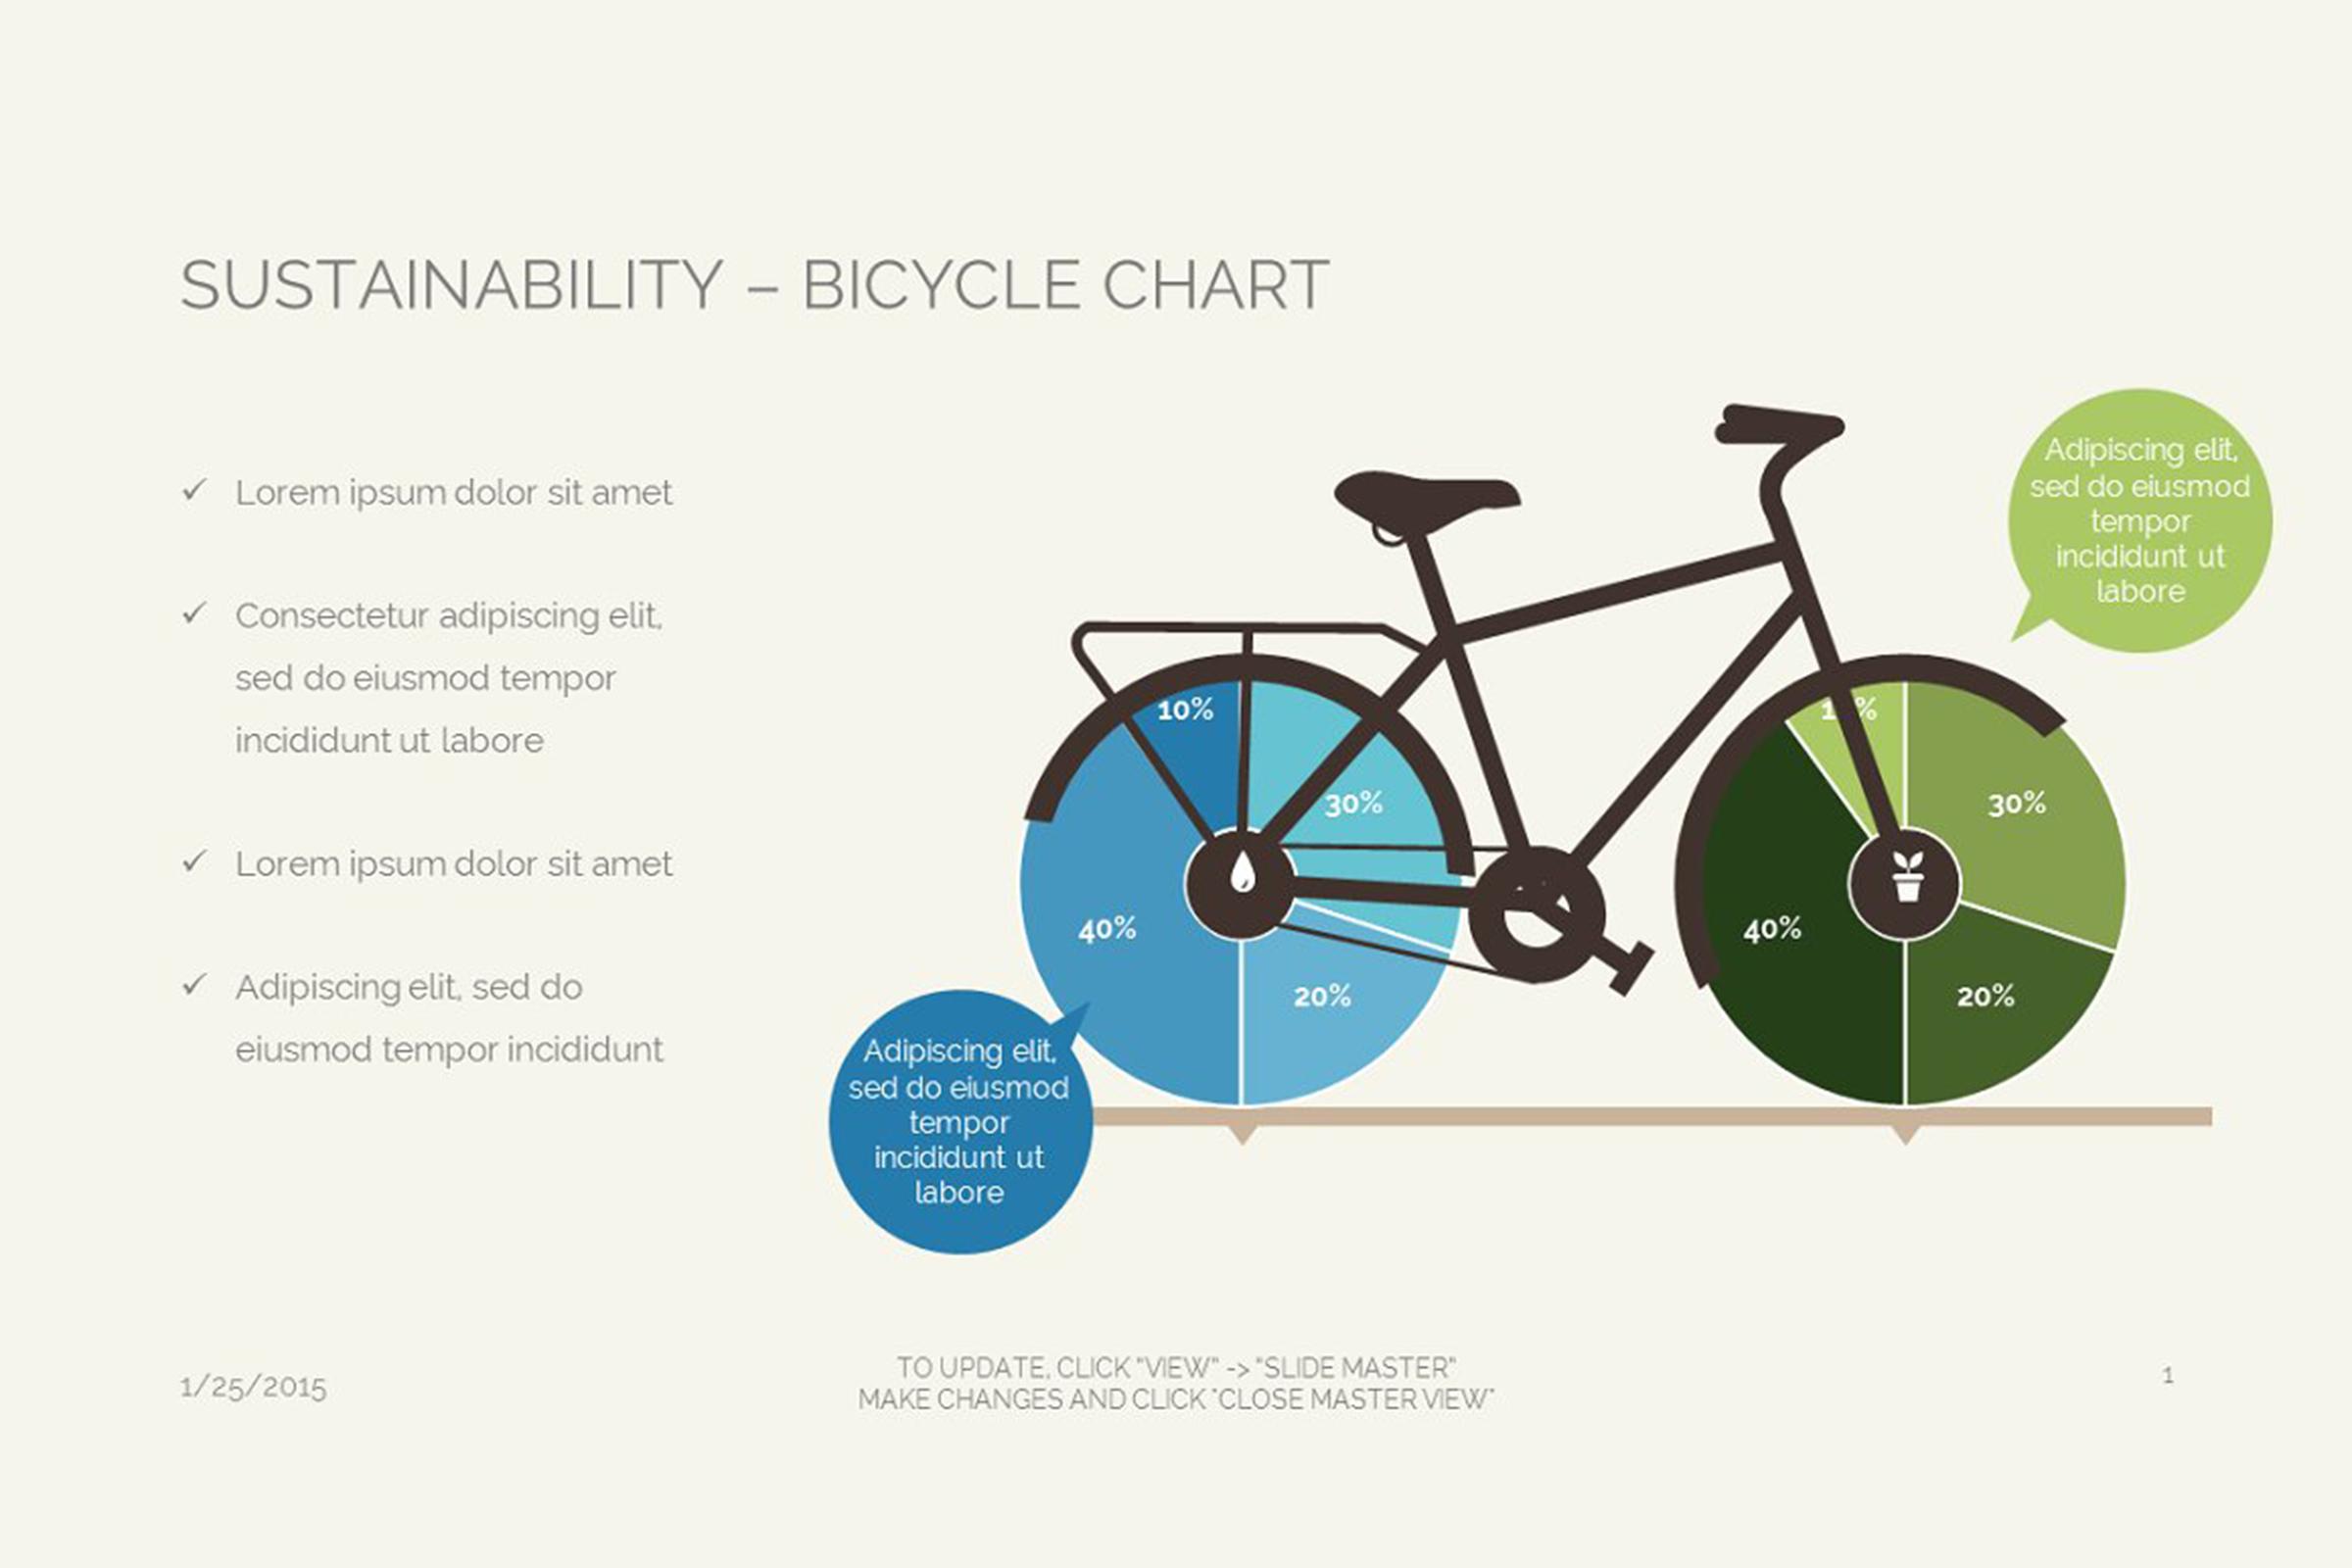 Sustainability Bicycle Chart example image 2